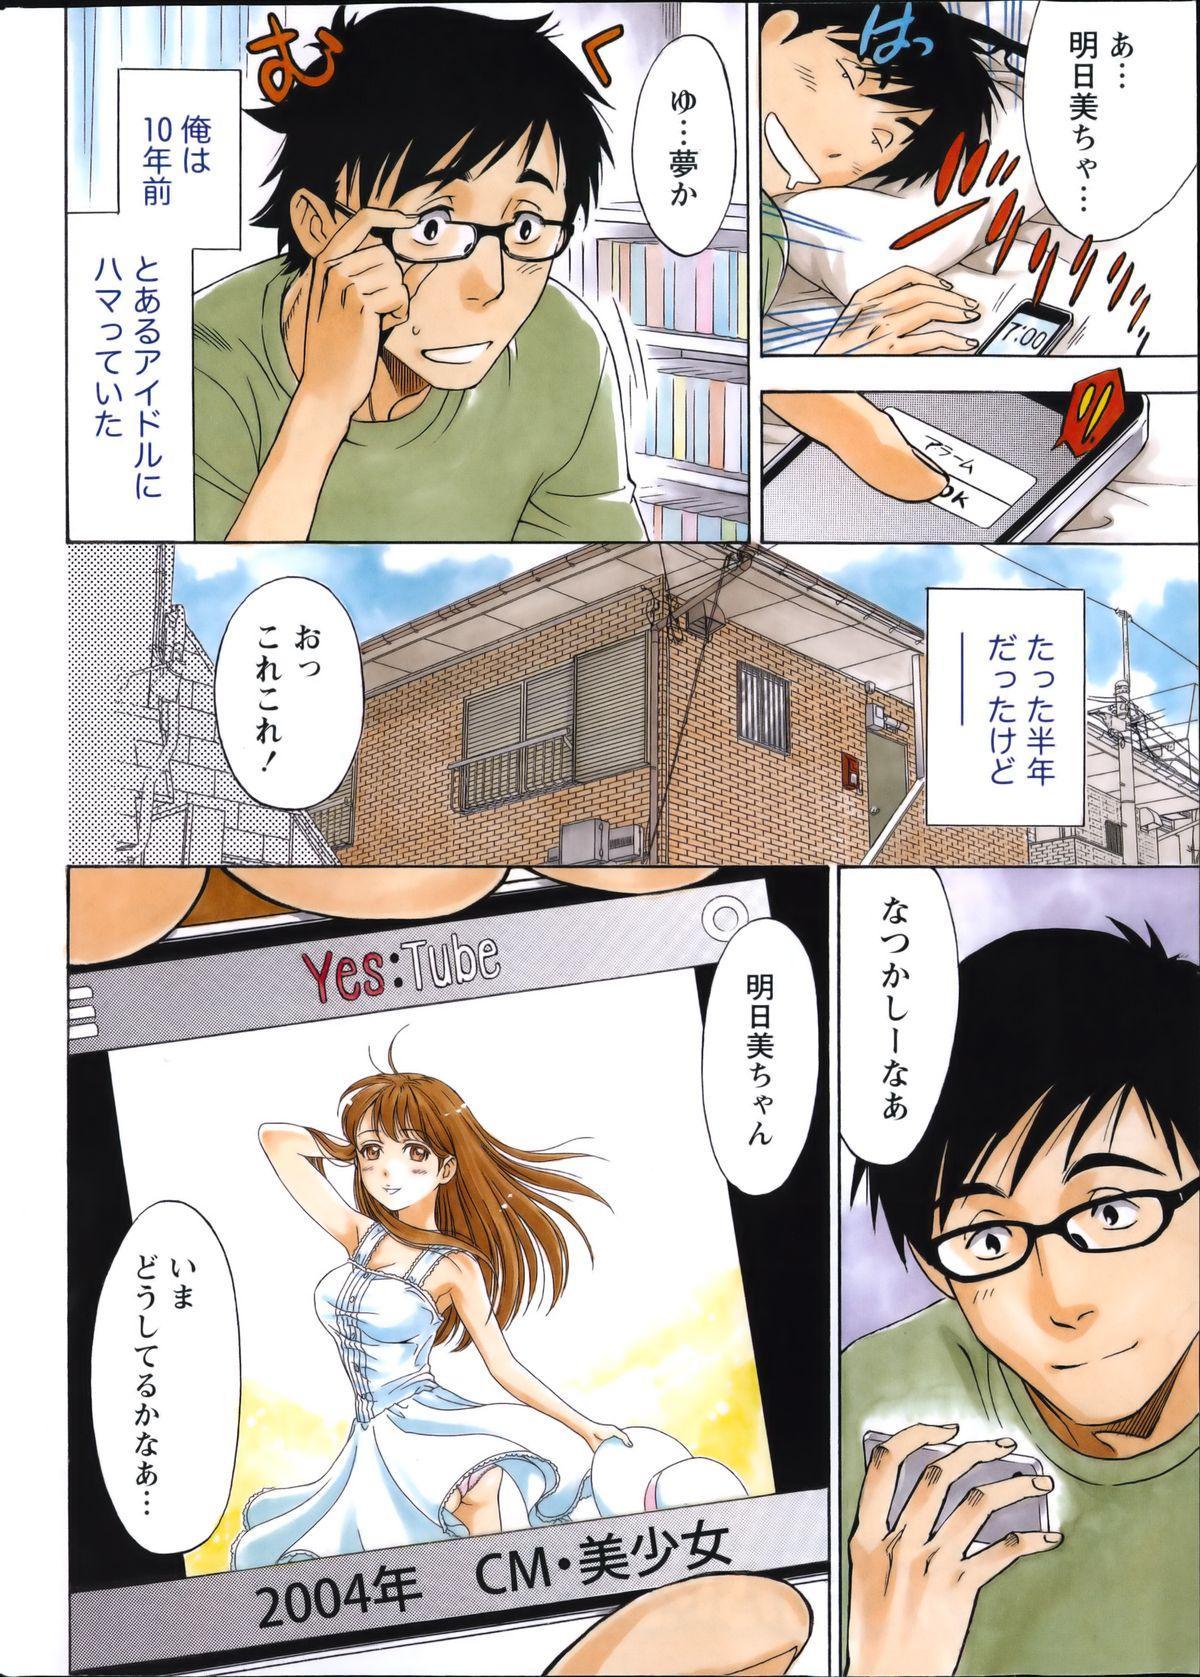 Monthly Vitaman 2014-07 5